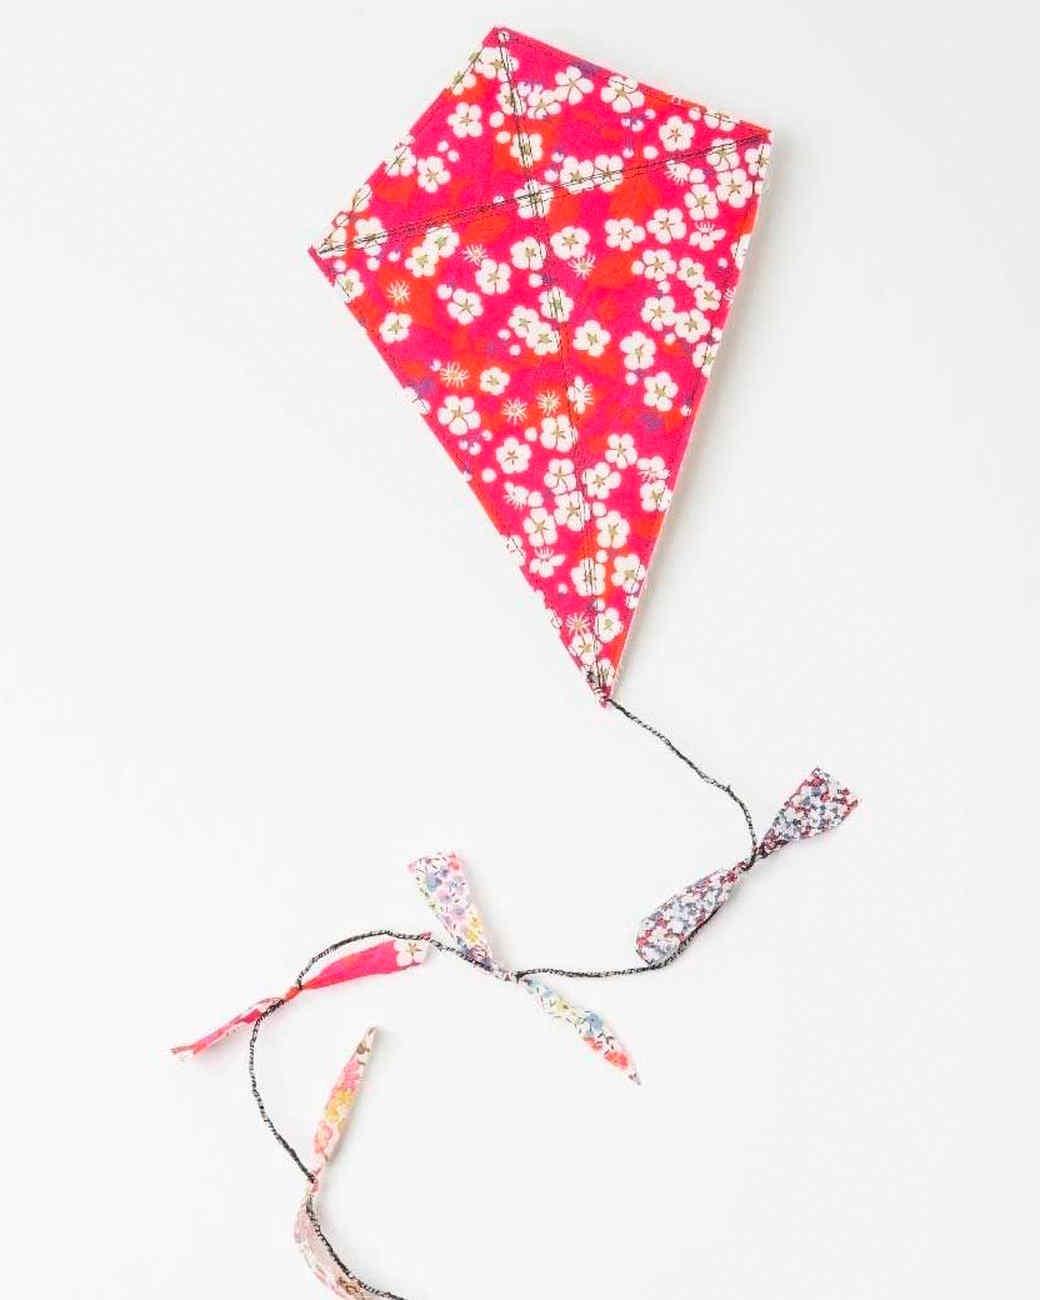 h-luv-fabrications-soft-sculpture-kite-liberty-of-london-cherry-blossom-0914.jpg